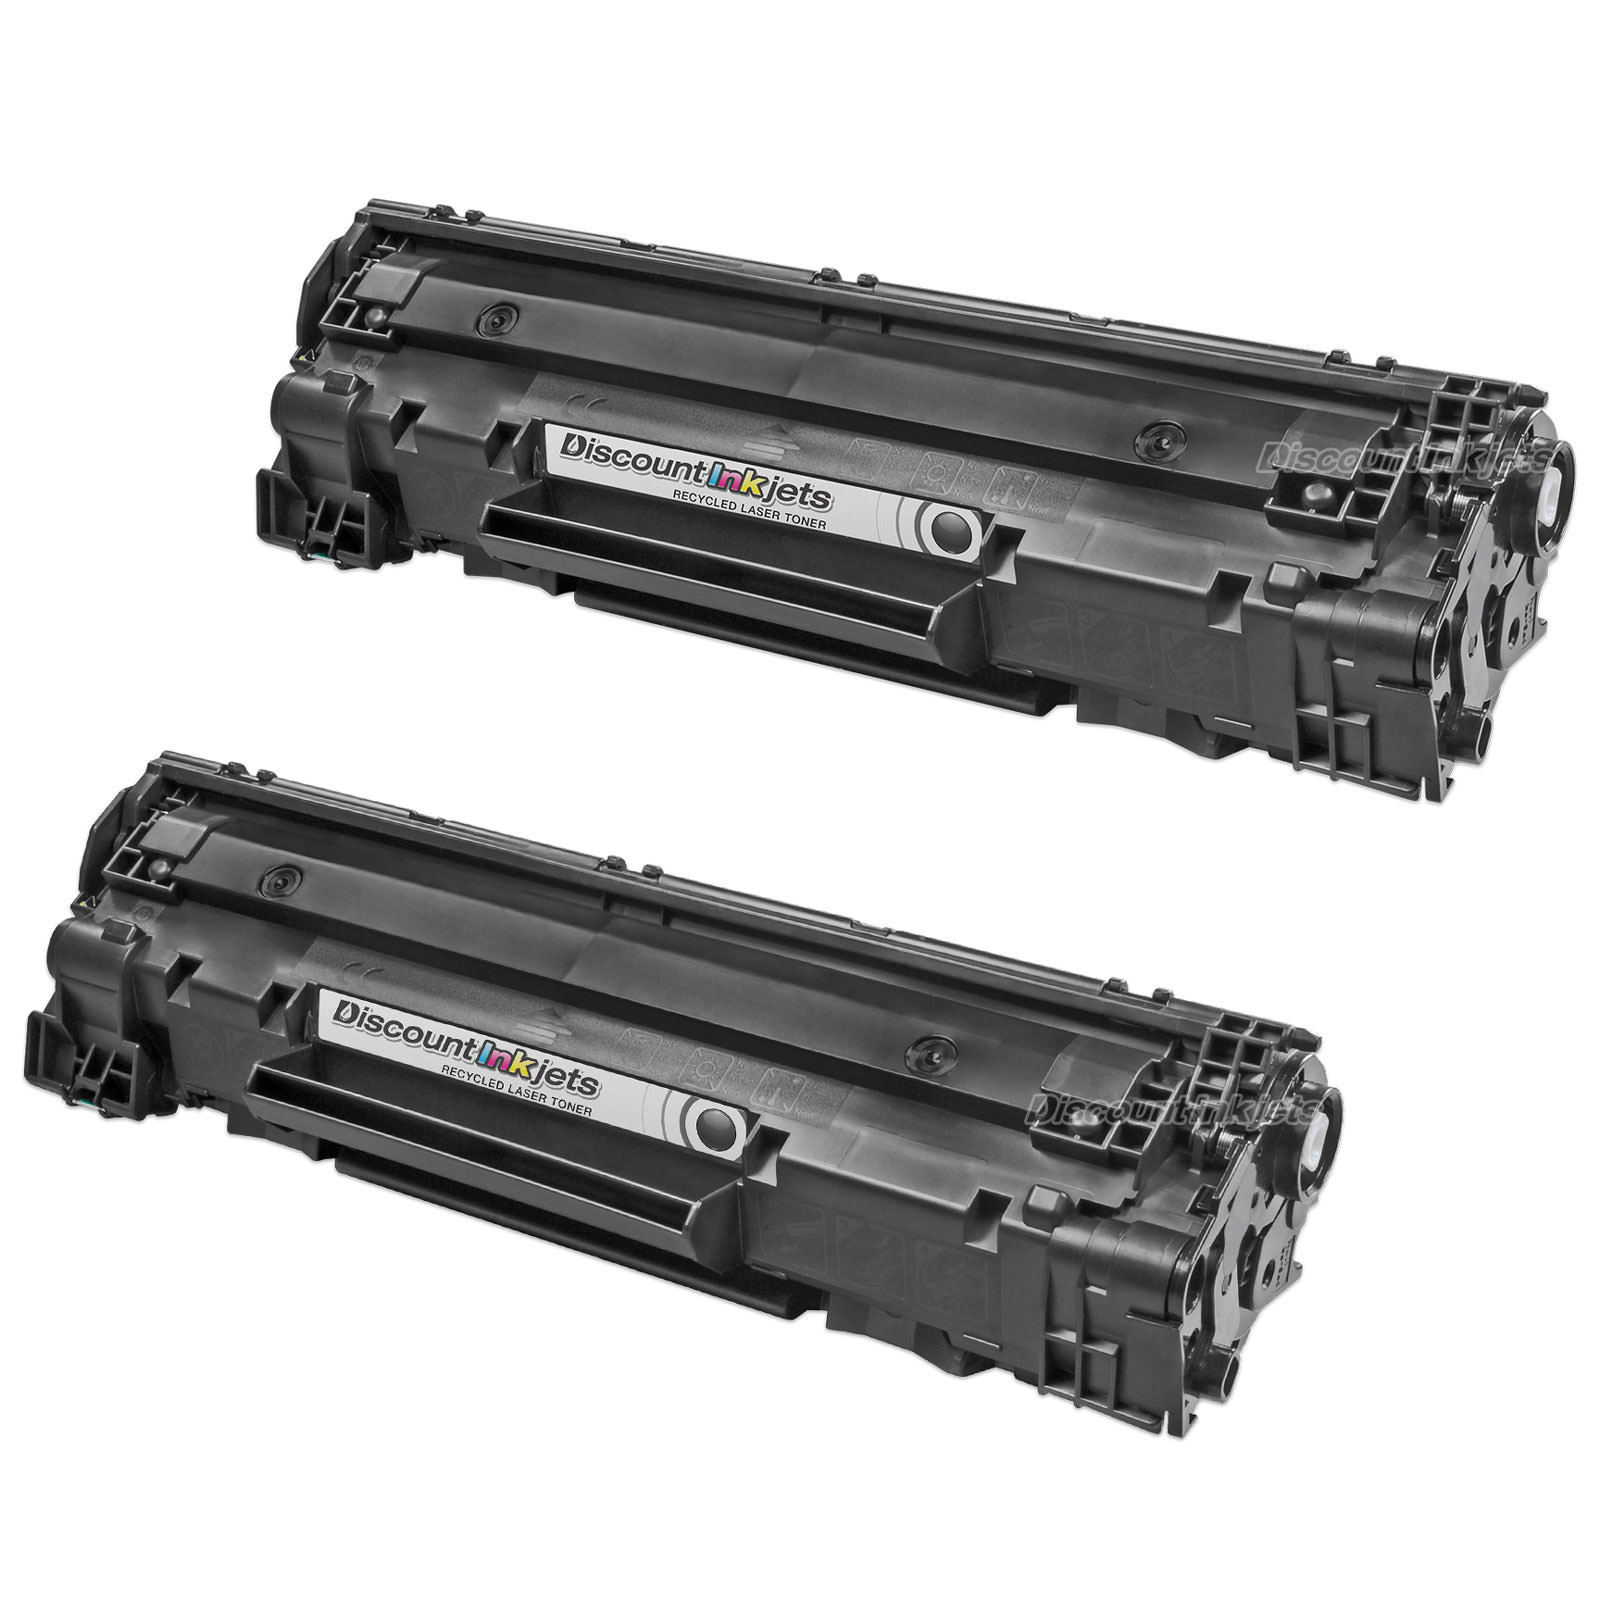 Replacement for HP CB435A; Models: Laserjet P1002 P1003 etc; Black Ink: PTCB435A P1004 MG Compatible Toner Cartridges